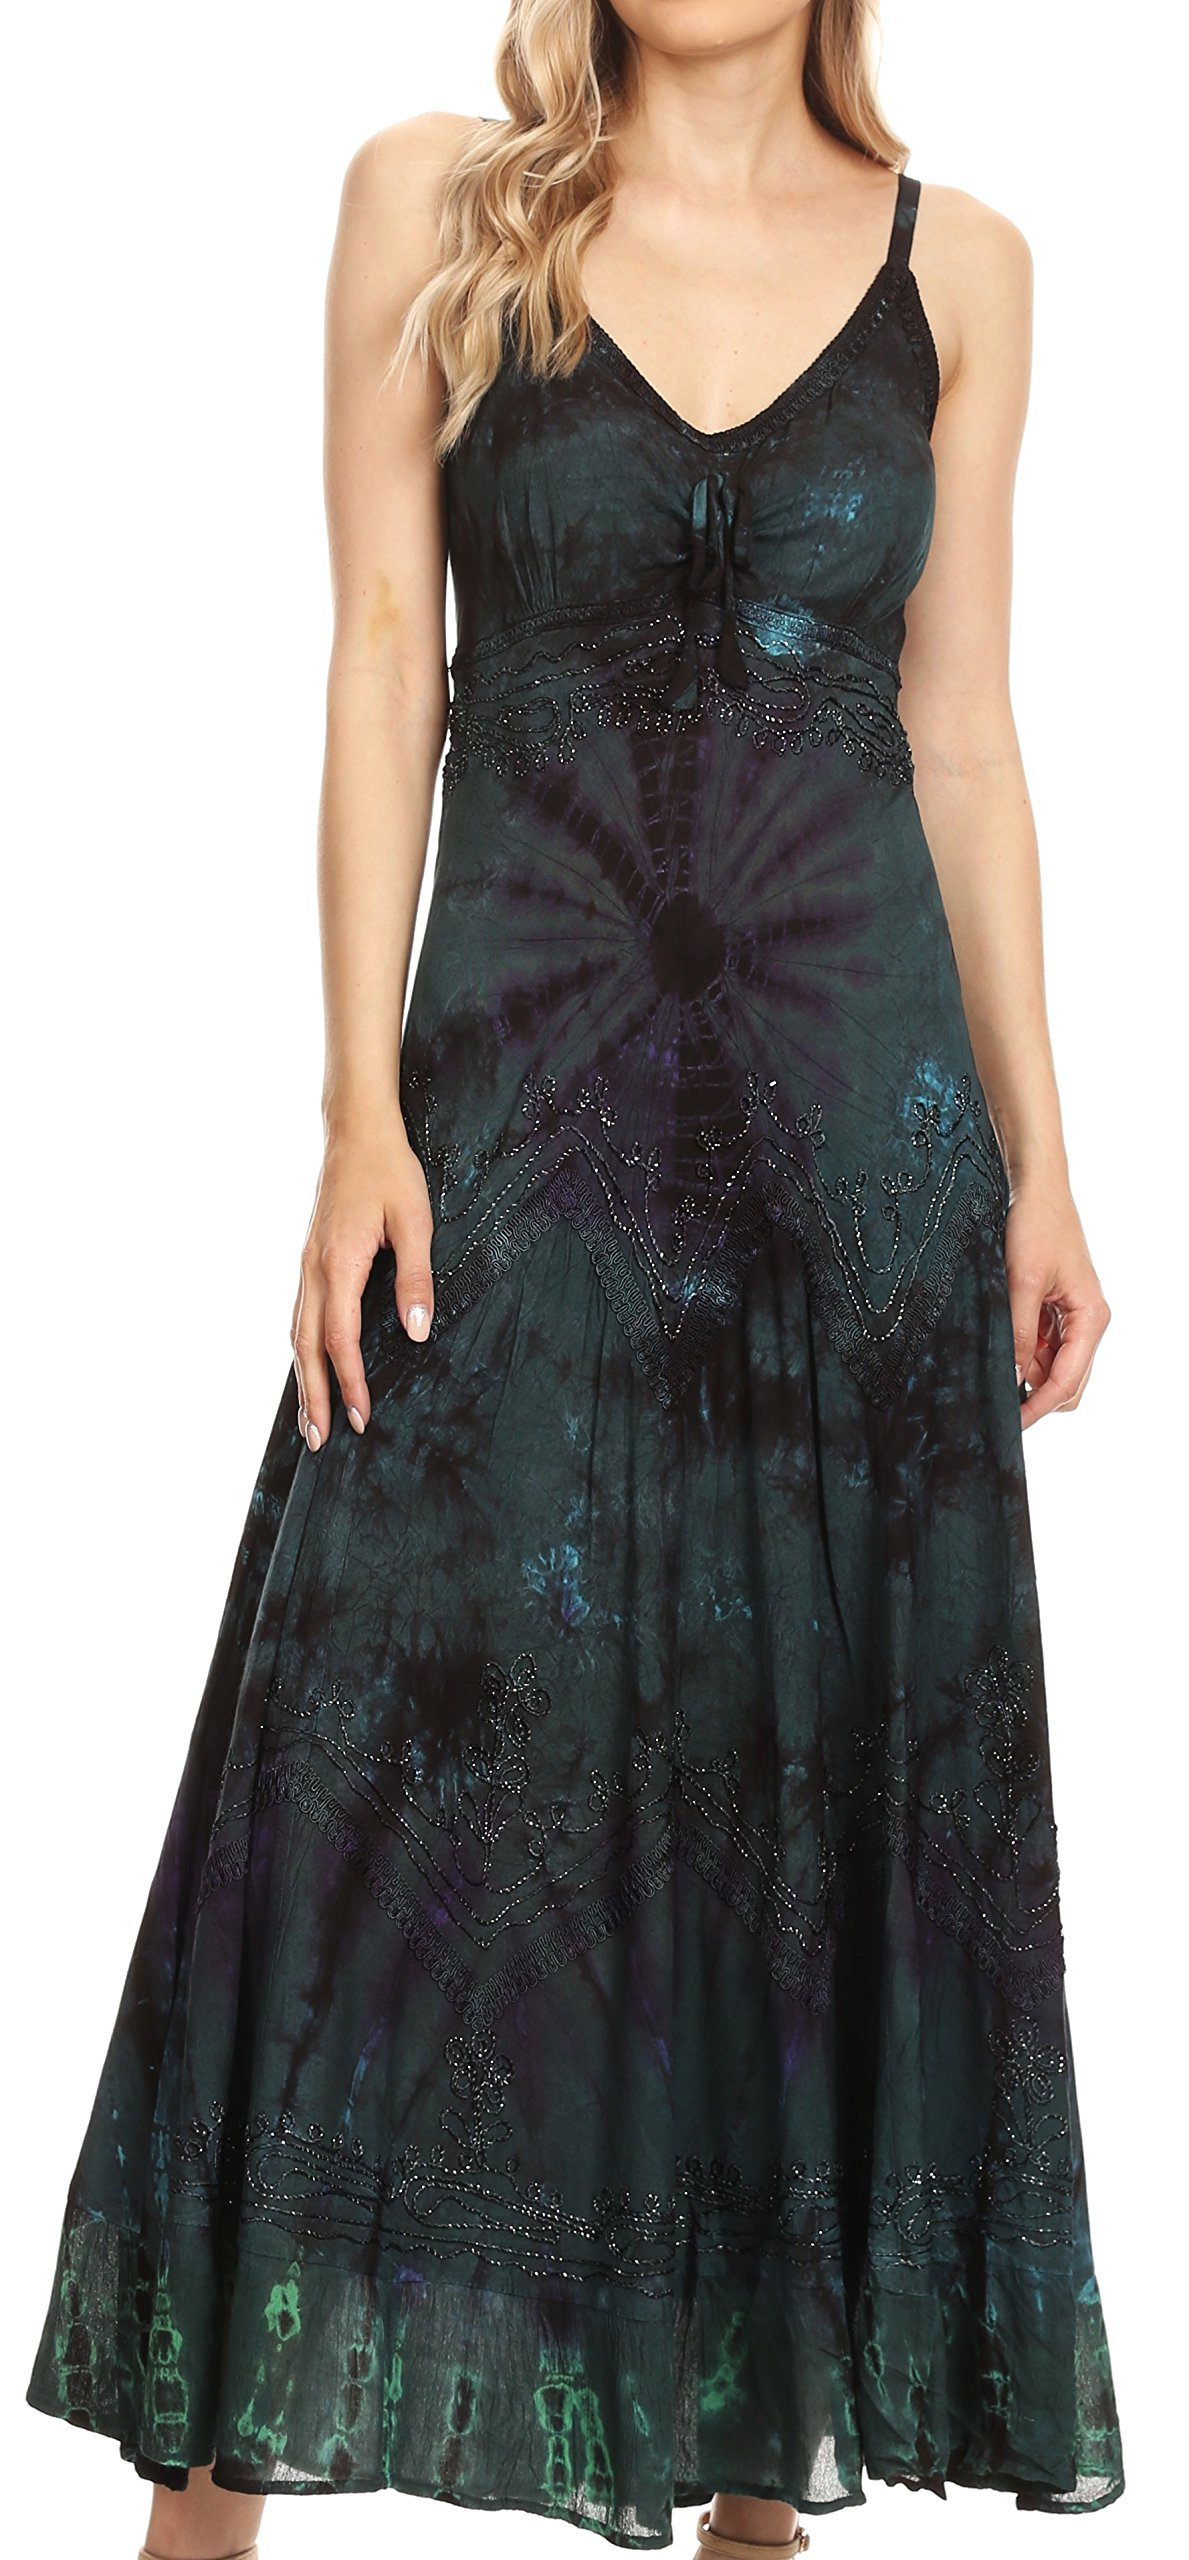 Sakkas 182104 - Adela Women's Tie Dye Embroidered Adjustable Spaghetti Straps Long Dress - Teal - 1X/2X